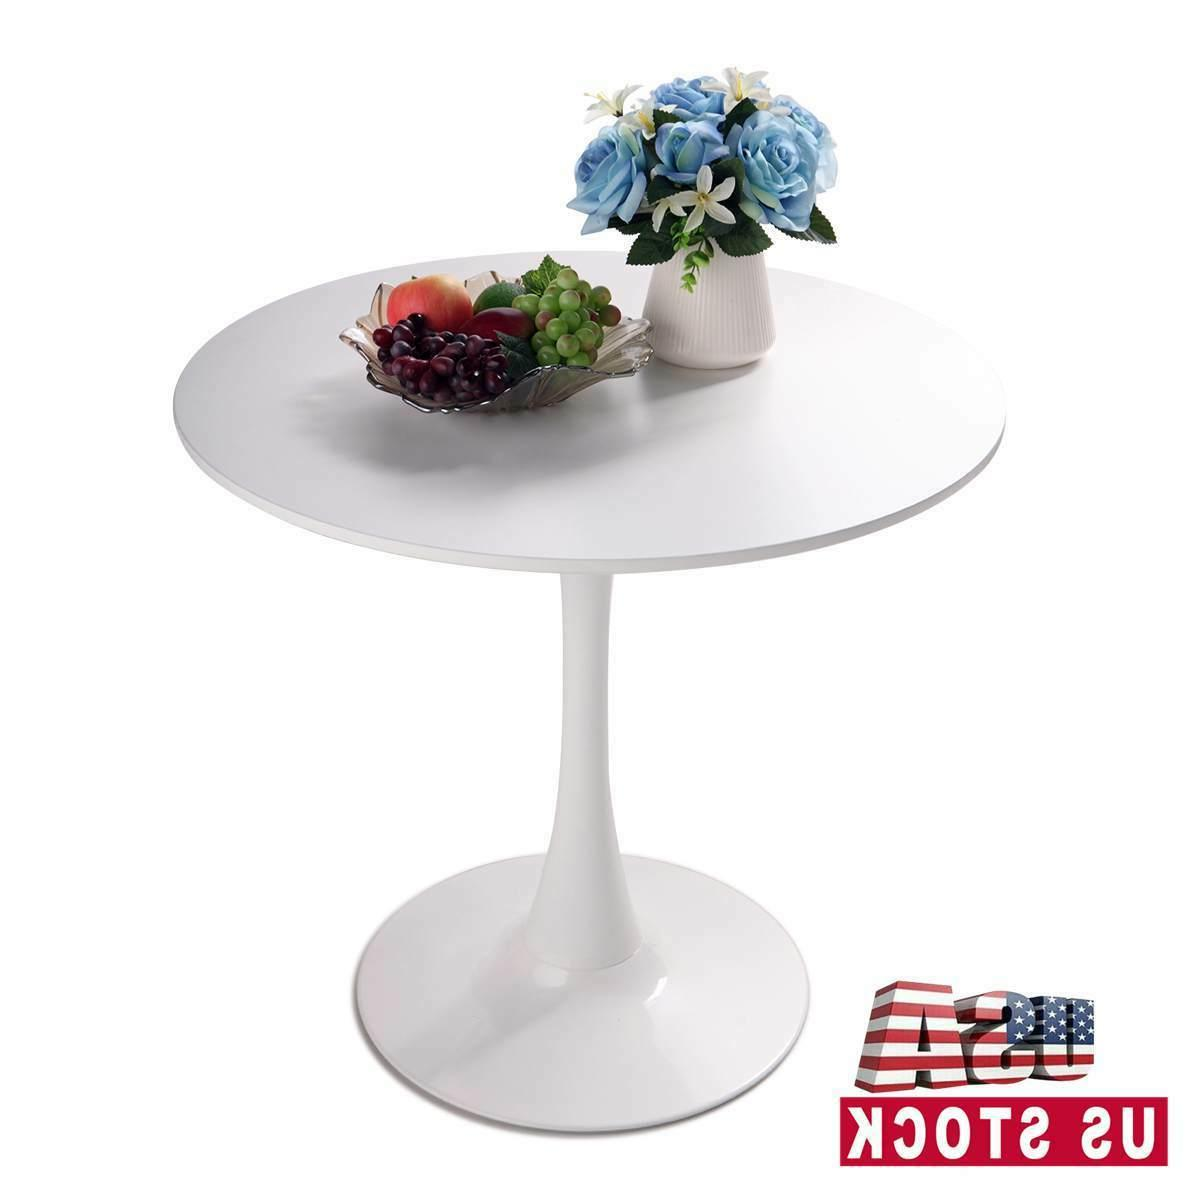 round pedestal table in white tulip design